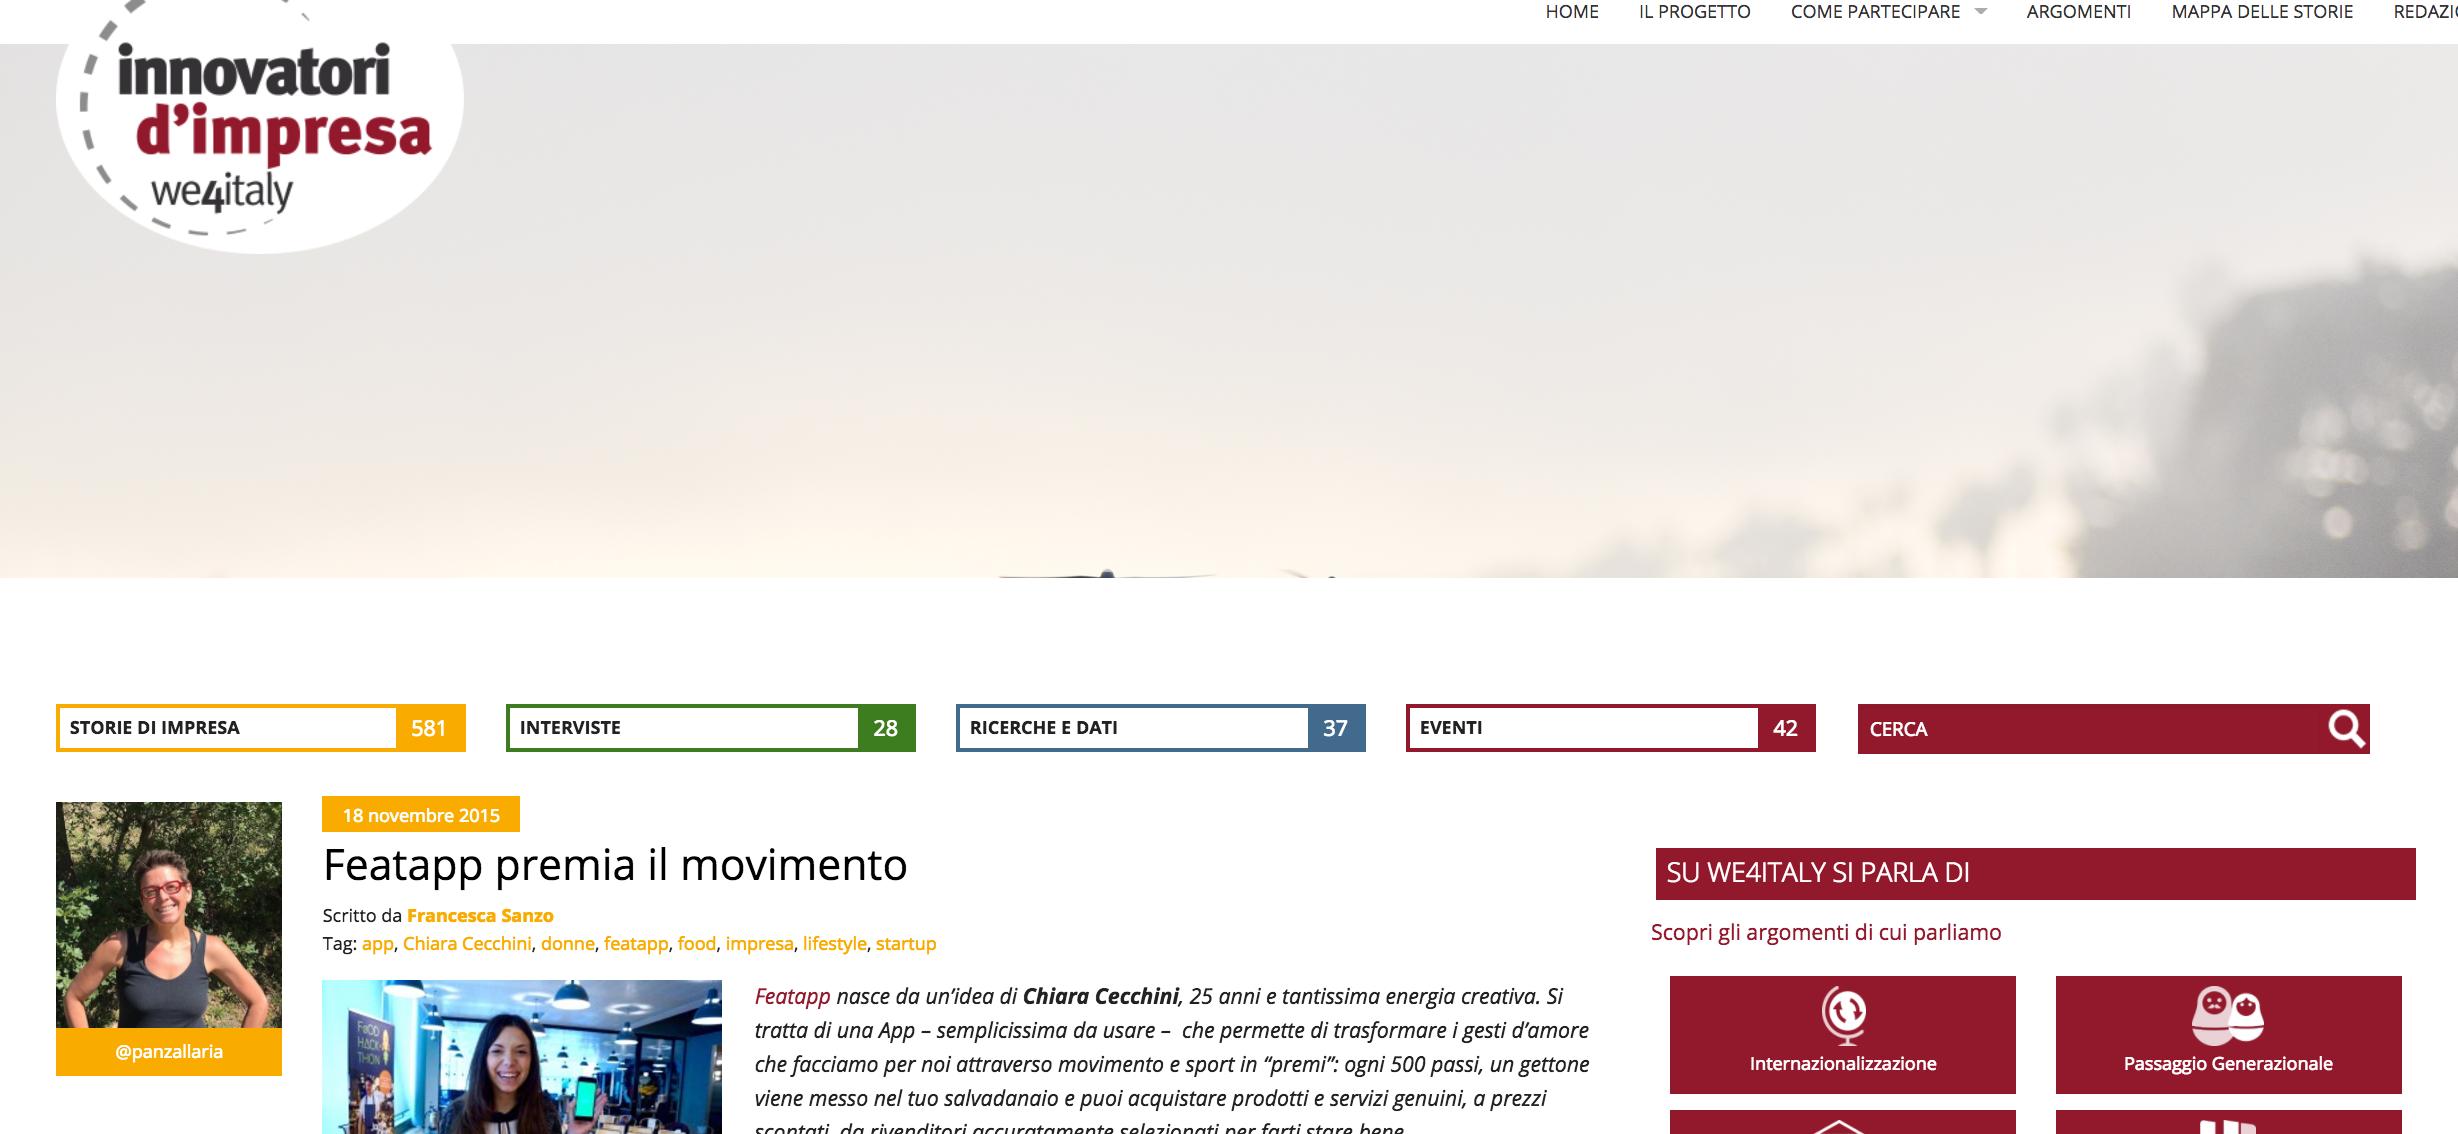 featapp premia il movimento - Innovatori d'Impresa, November 2015